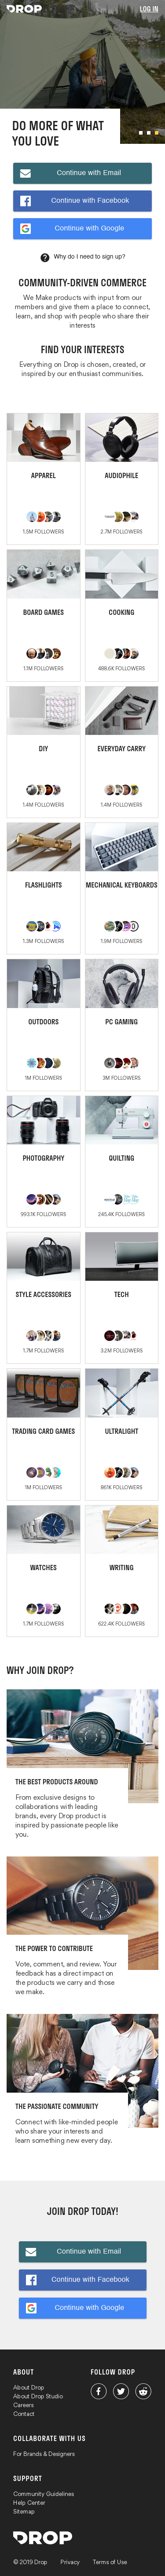 Example of Design for Online Communities, Mobile Landing Page by drop.com | Mobile Landing Page Design